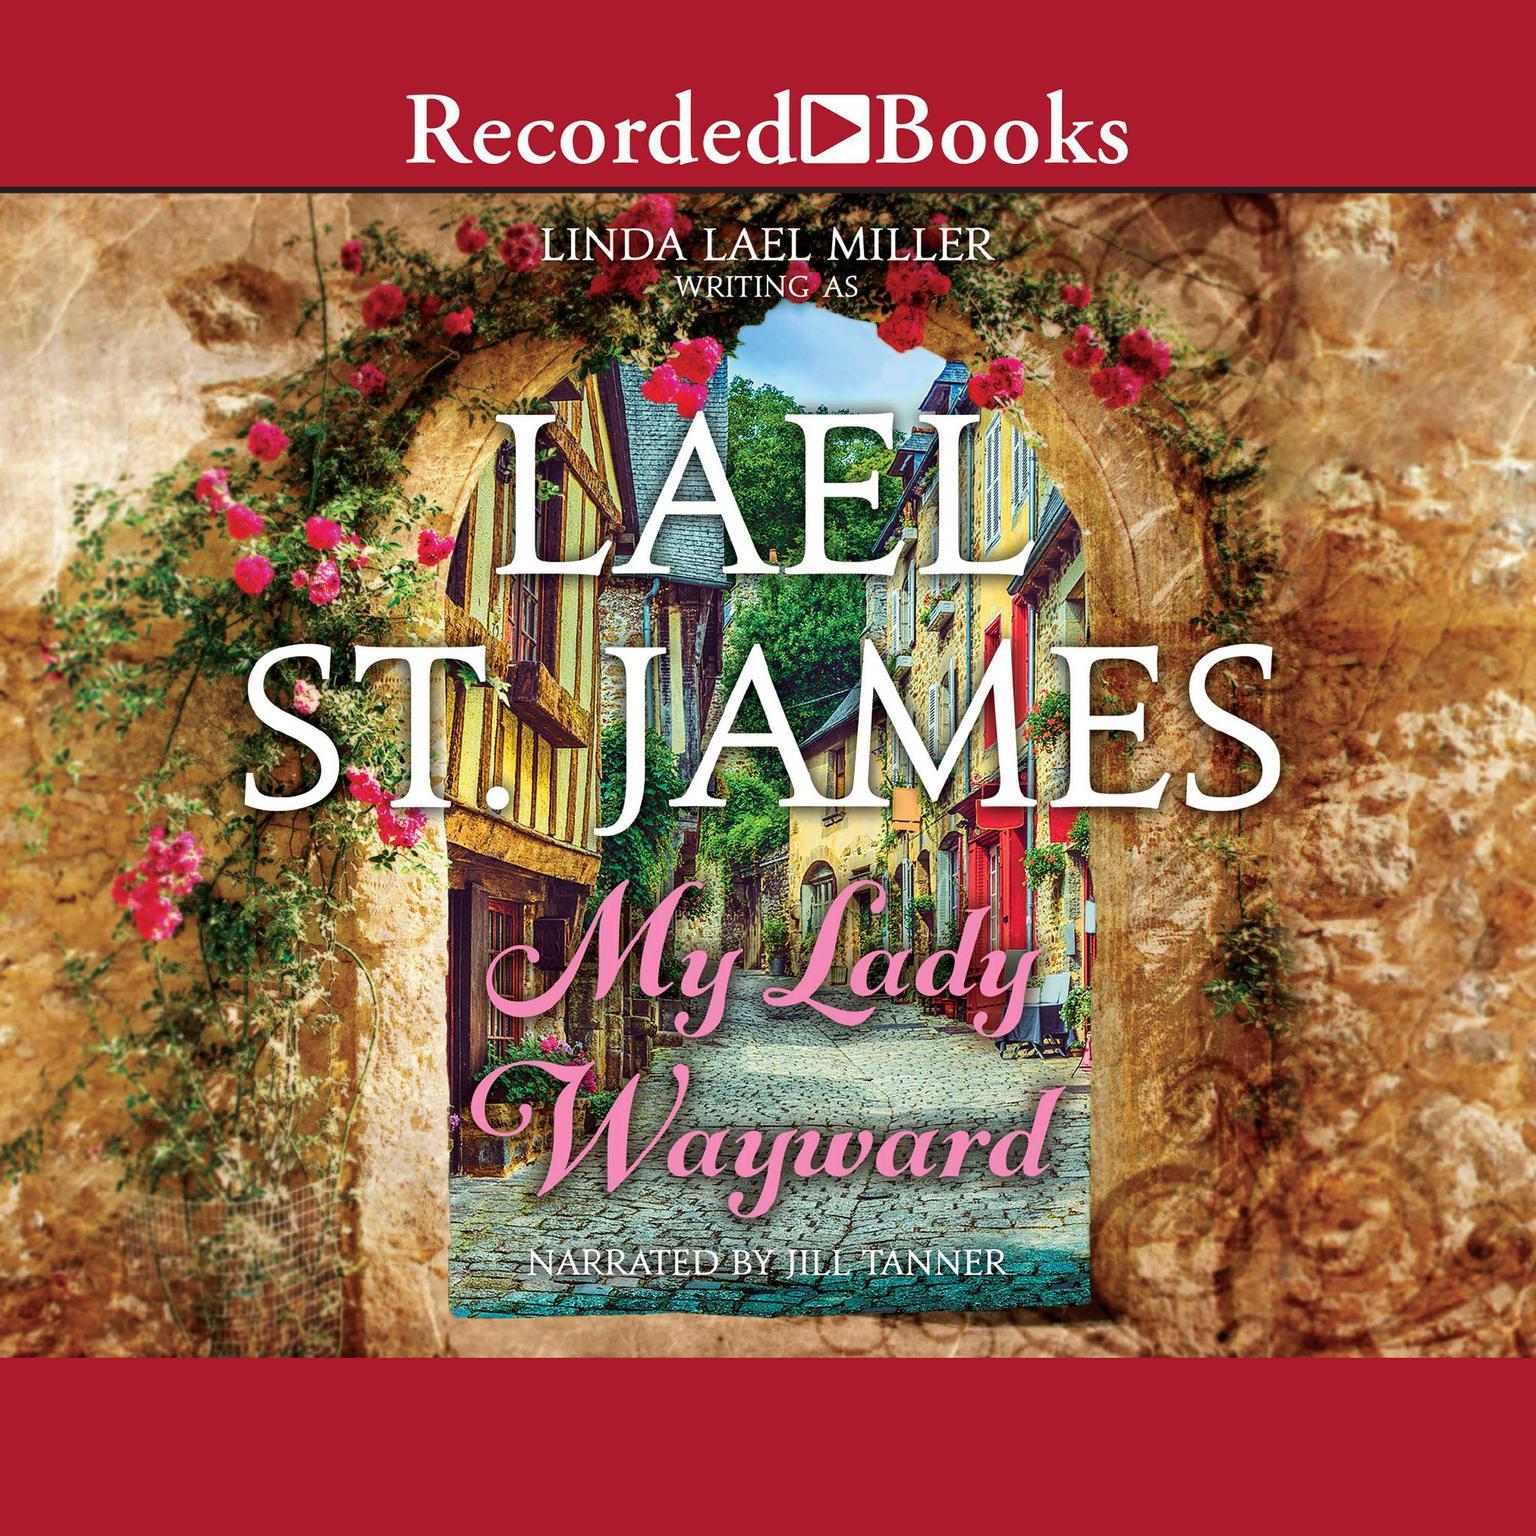 My Lady Wayward Audiobook, by Lael St. James